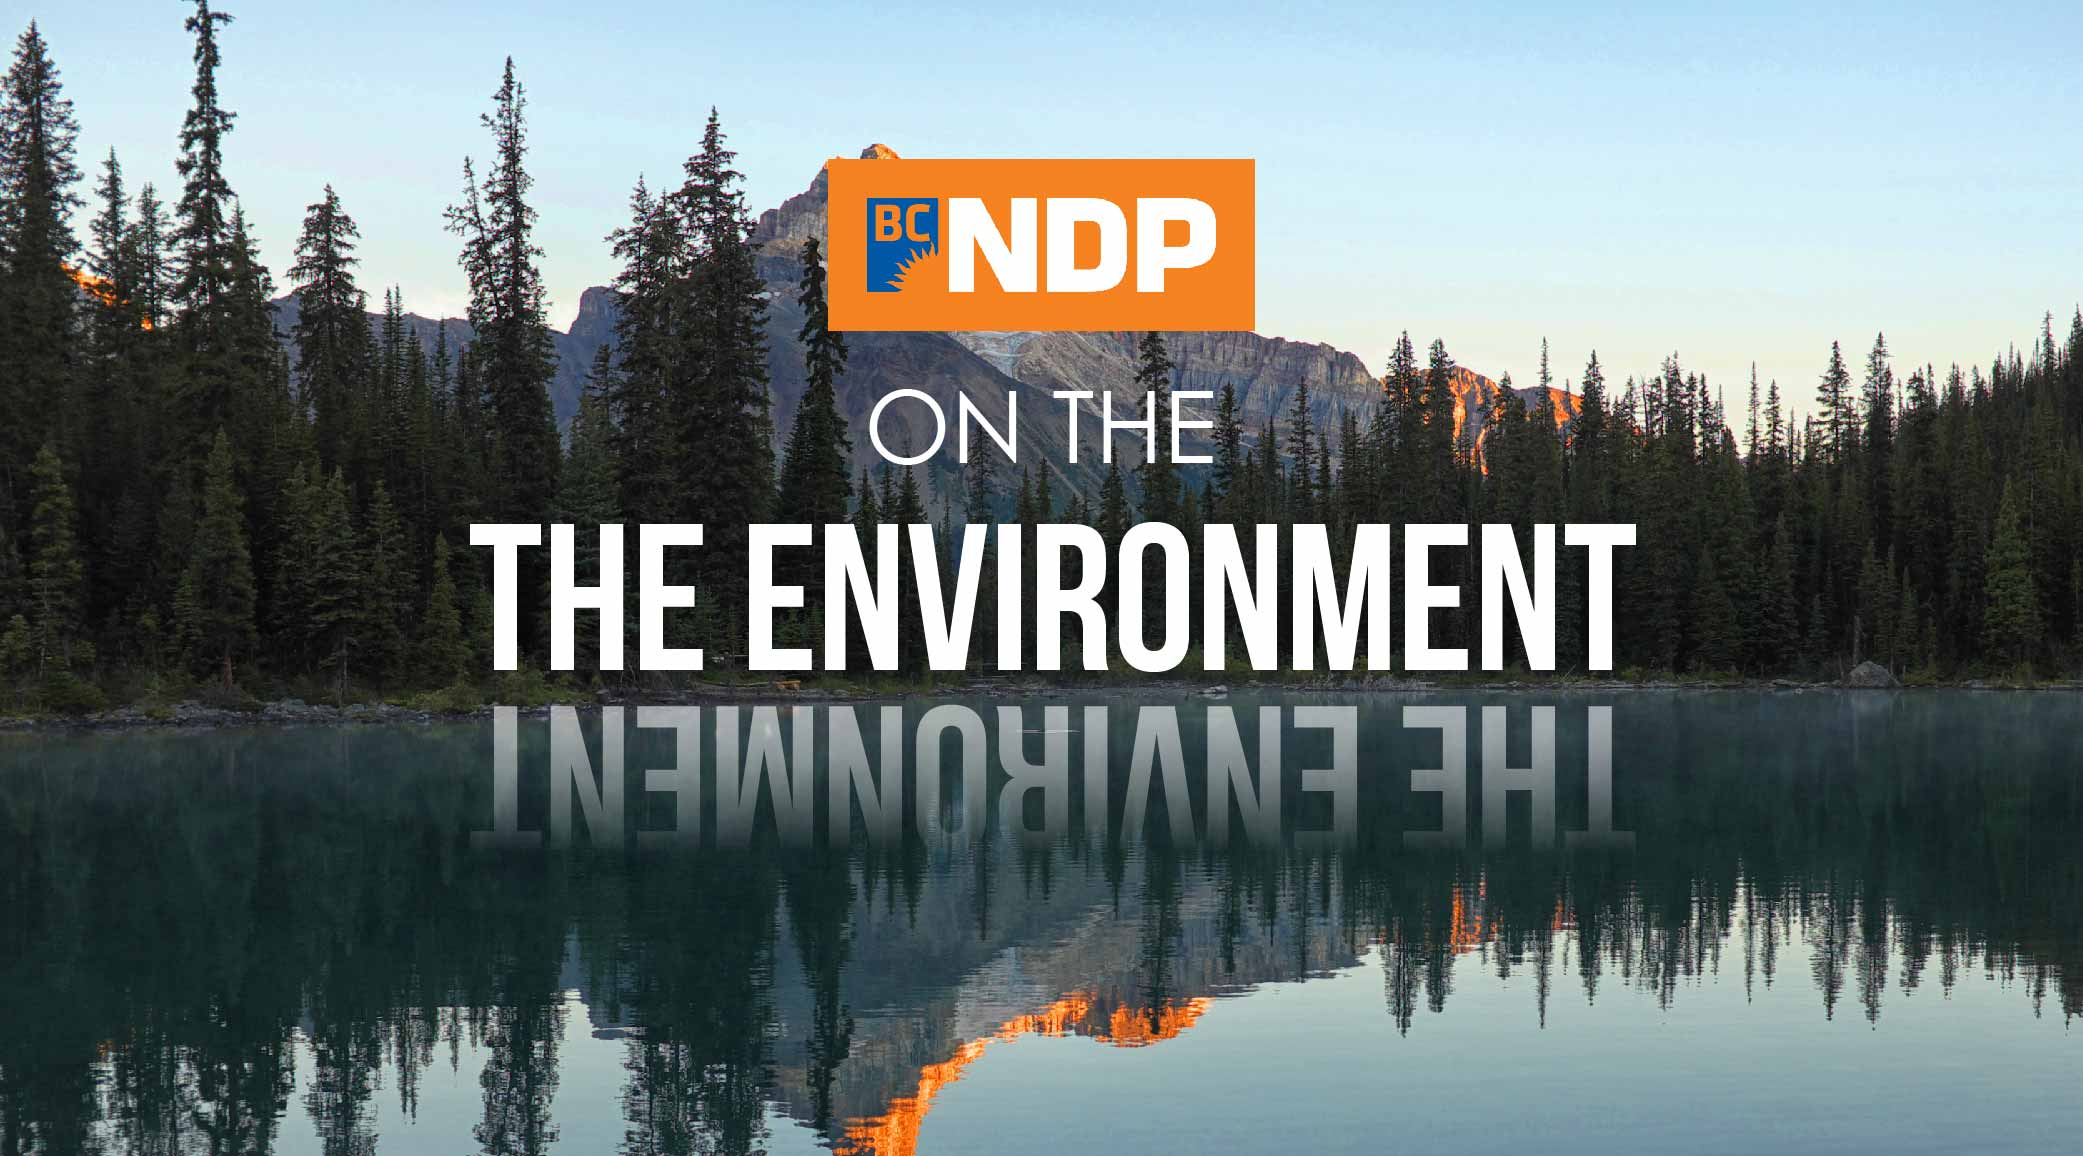 Ndp environment